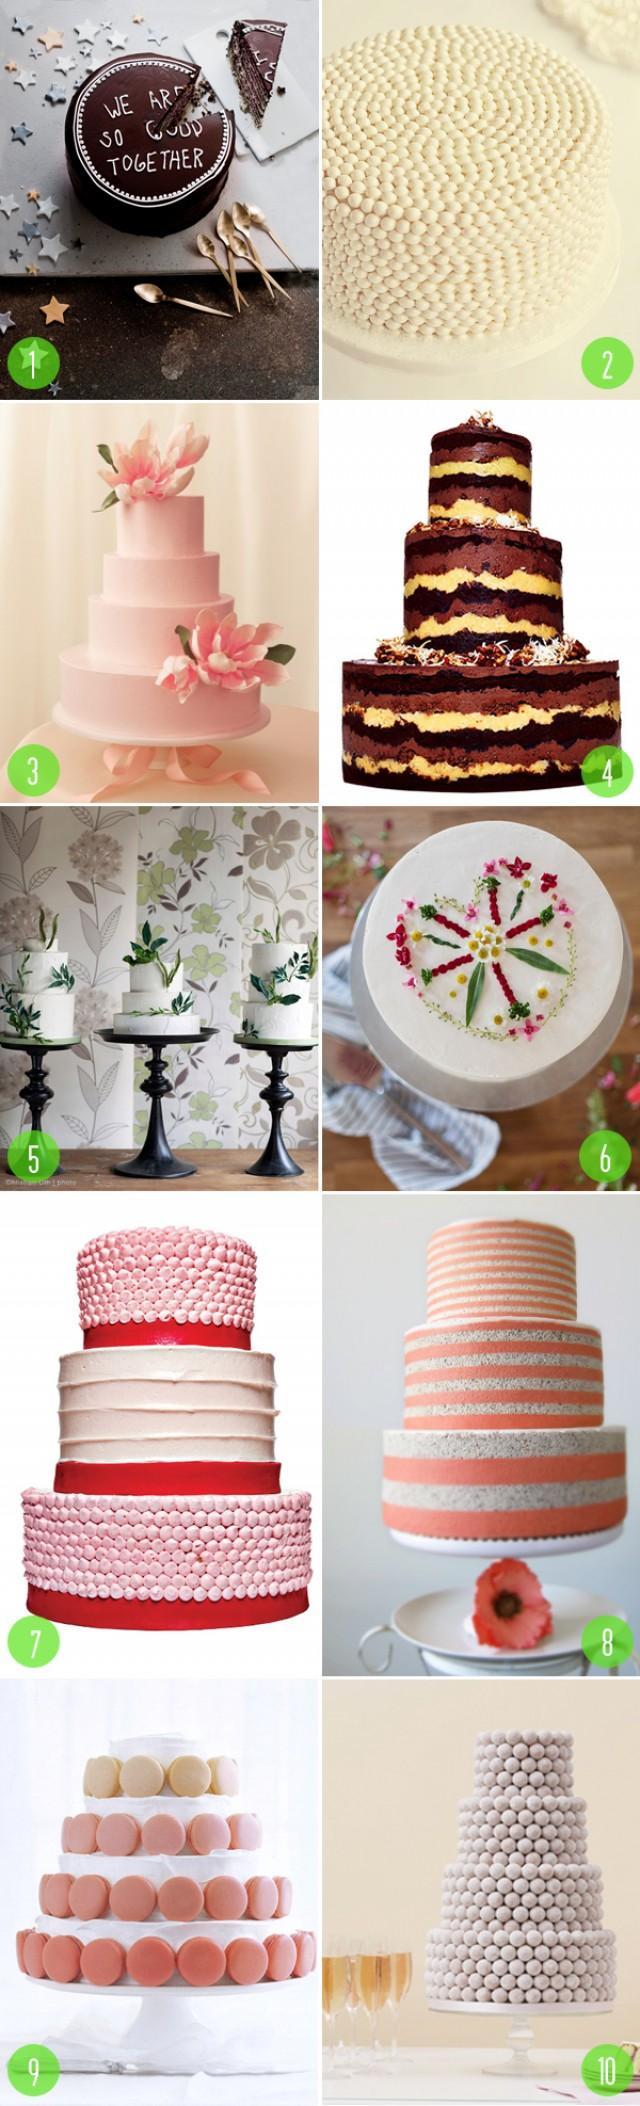 Top 10: Non-fondant Wedding Cakes - Weddbook